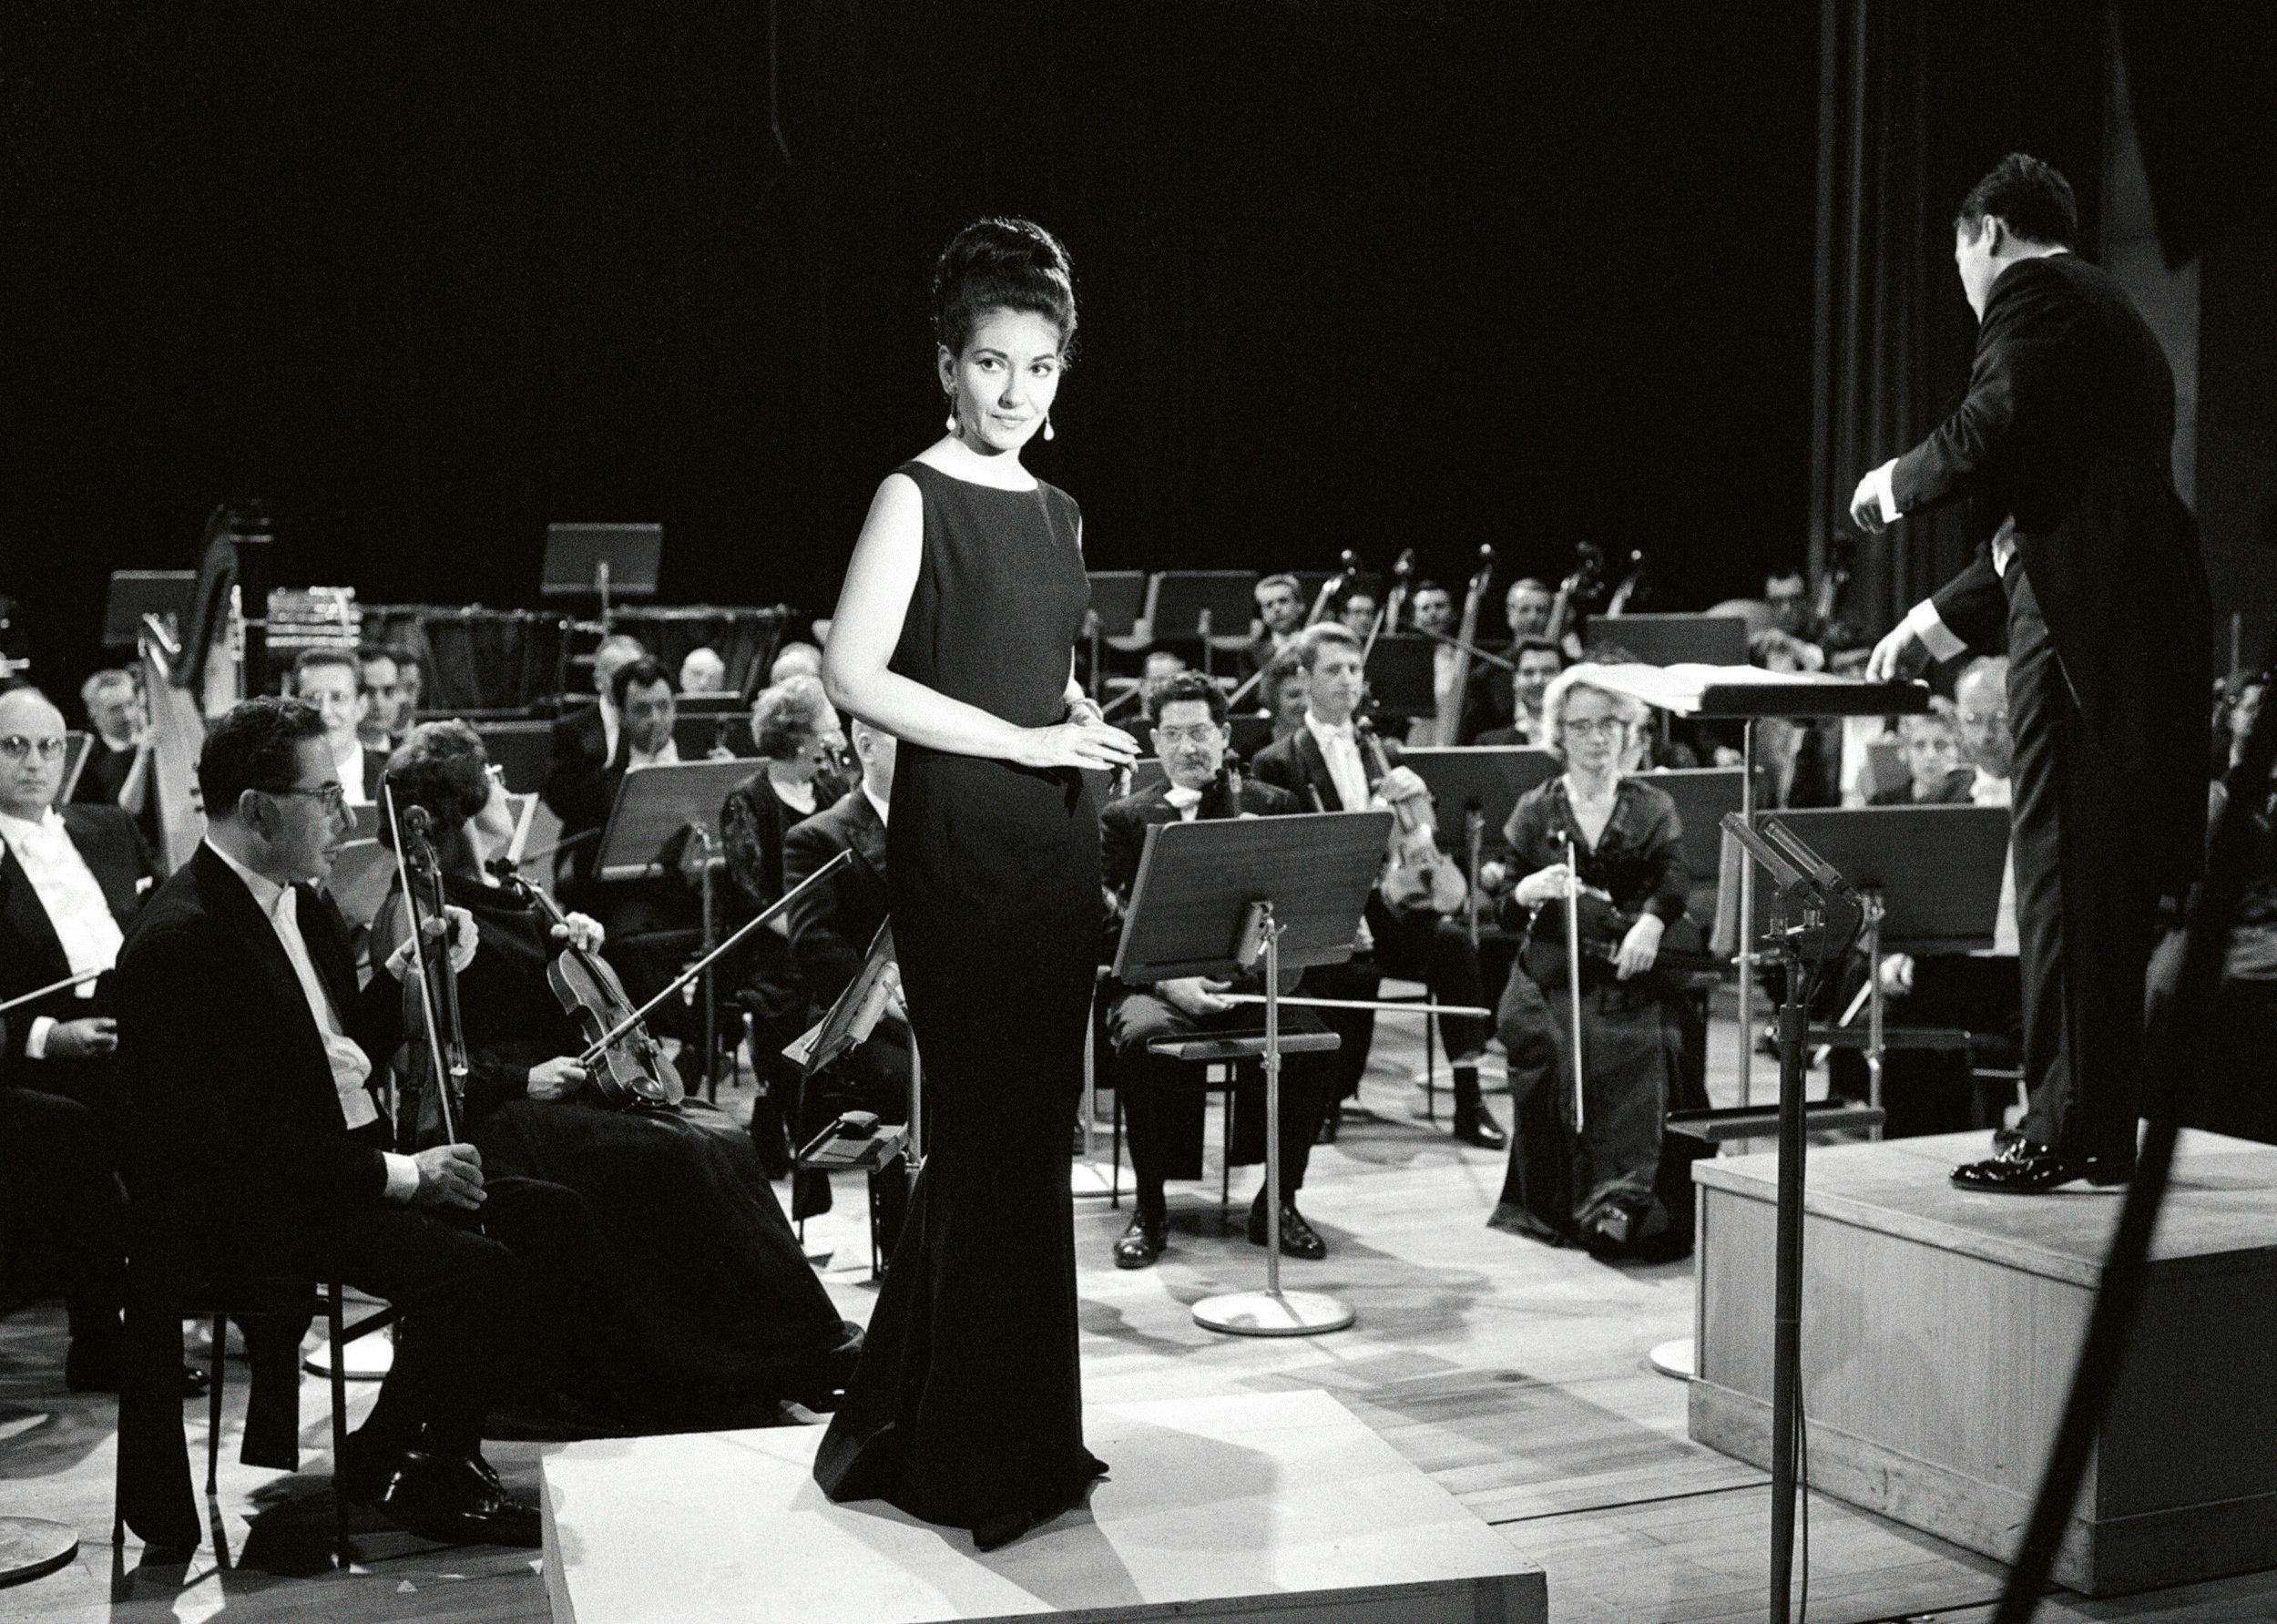 Les Grands Interprétes, Paris 1965 © Fonds de Dotation Maria Callas